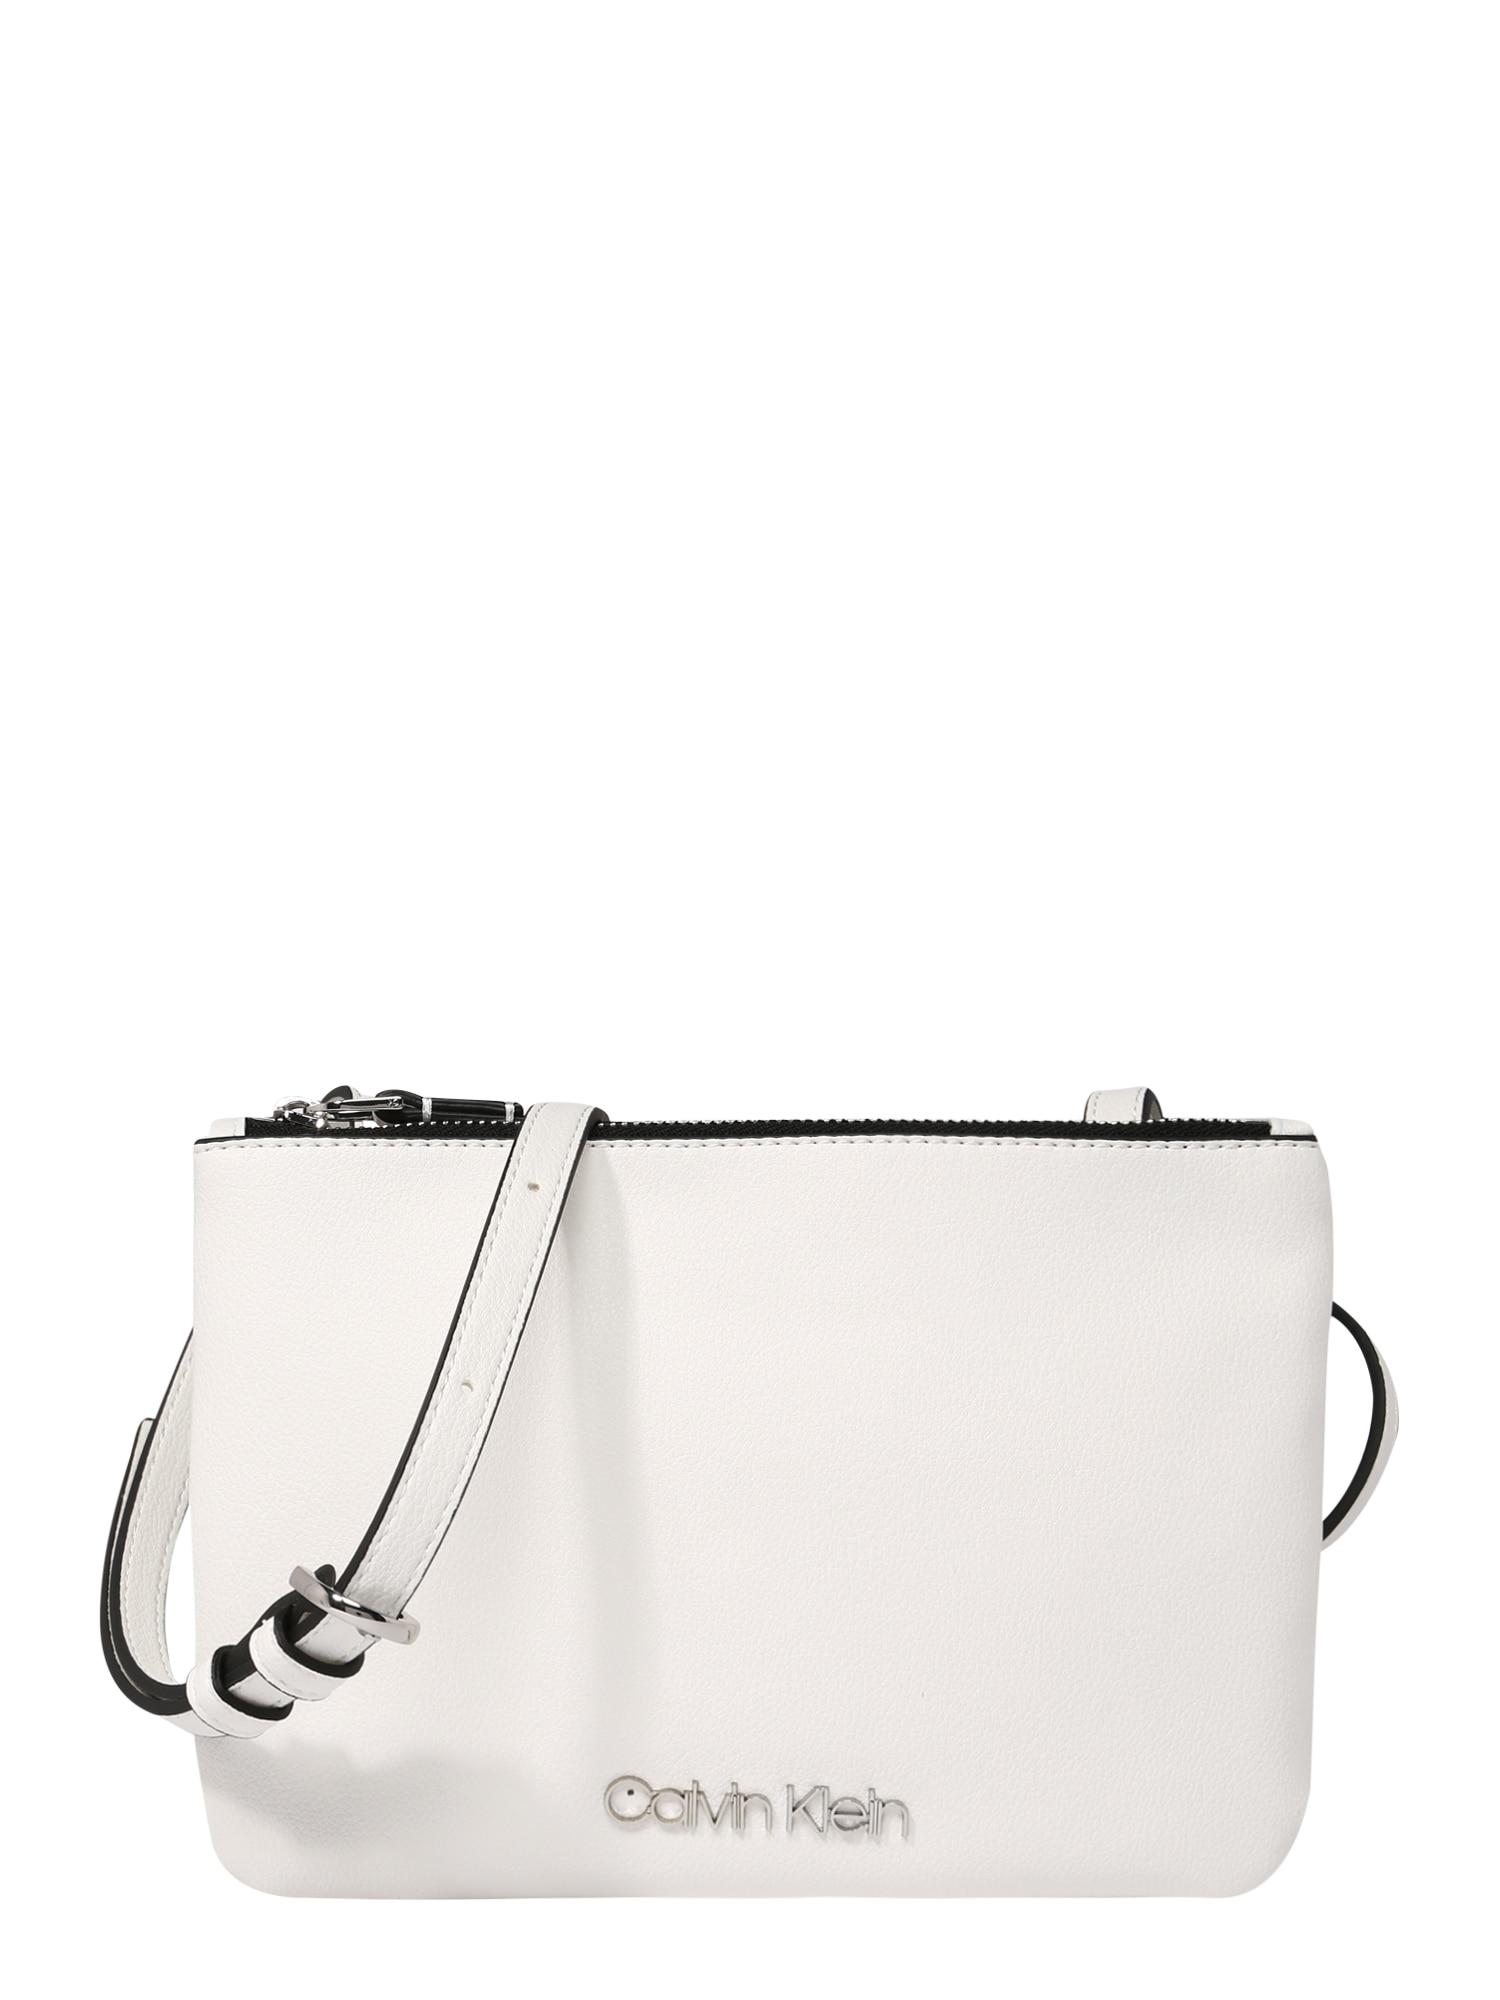 Taška přes rameno CK MUST EW CROSSBODY WH bílá Calvin Klein